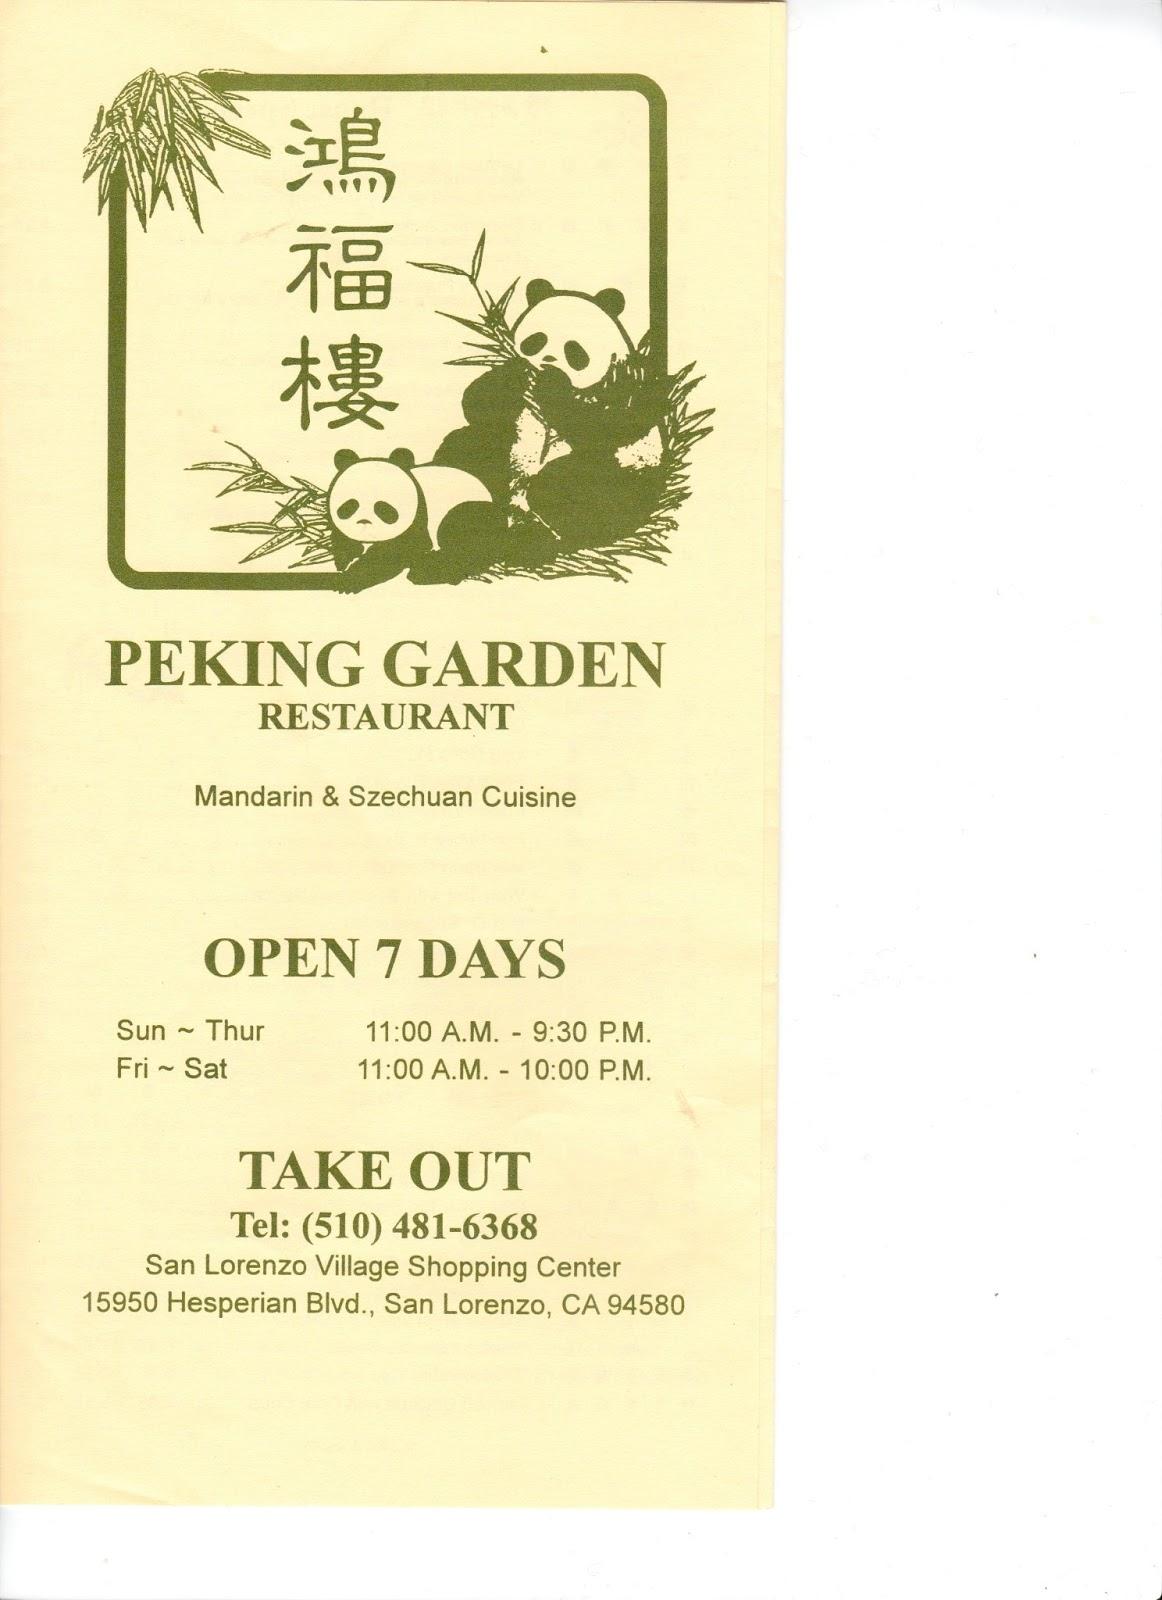 Peking Garden   San Lorenzo Menu 15950 Hesperian Blvd San Lorenzo, CA 94580